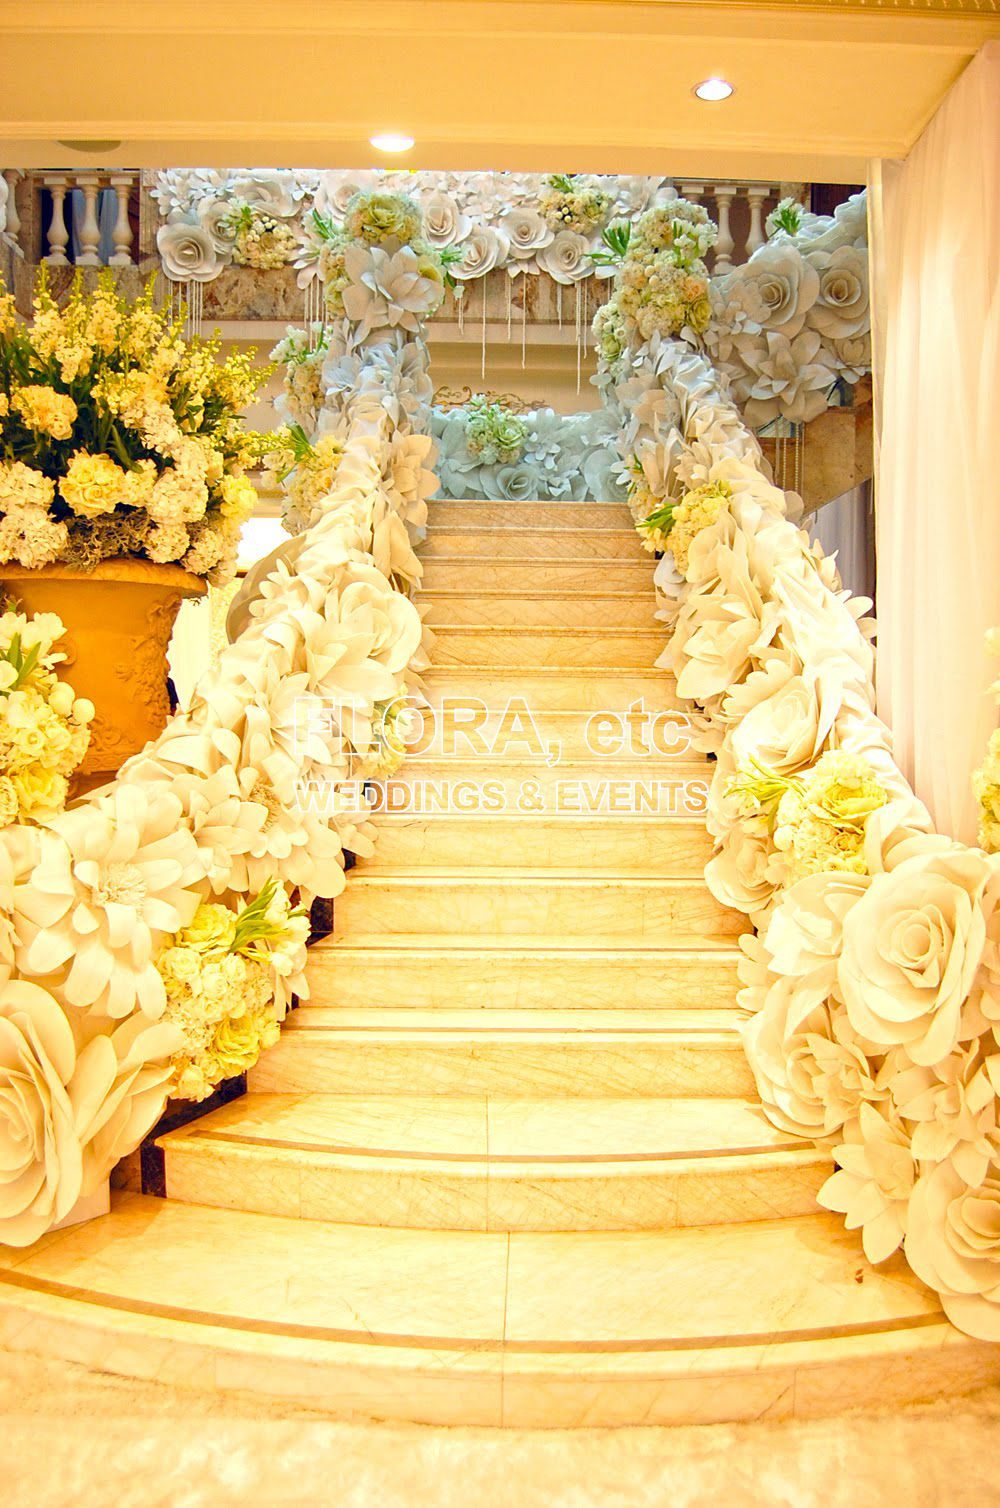 Flora Et Cetera Falling Into Love Eventos Pinterest Flora